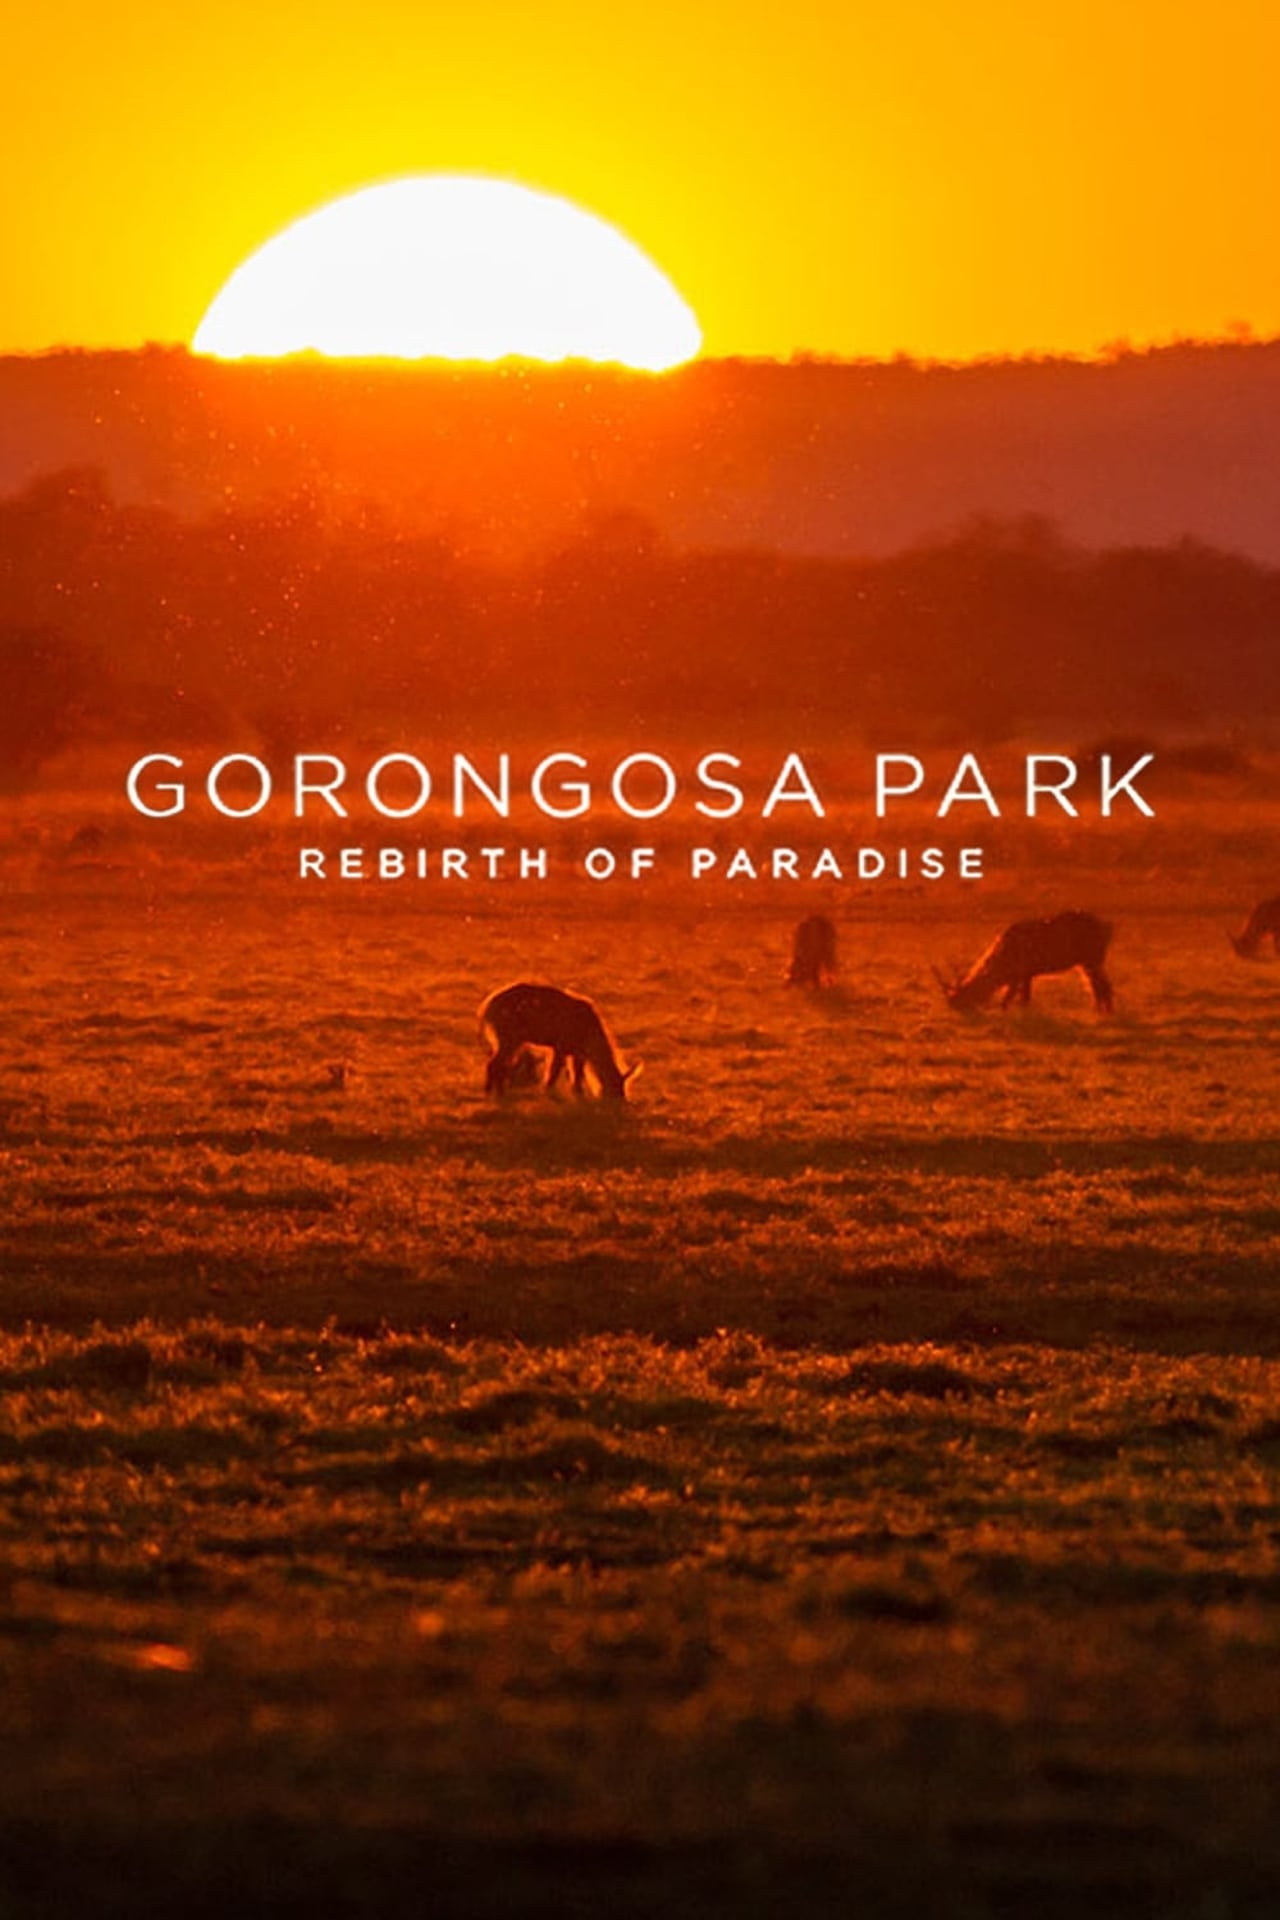 Gorongosa Park: Rebirth of Paradise